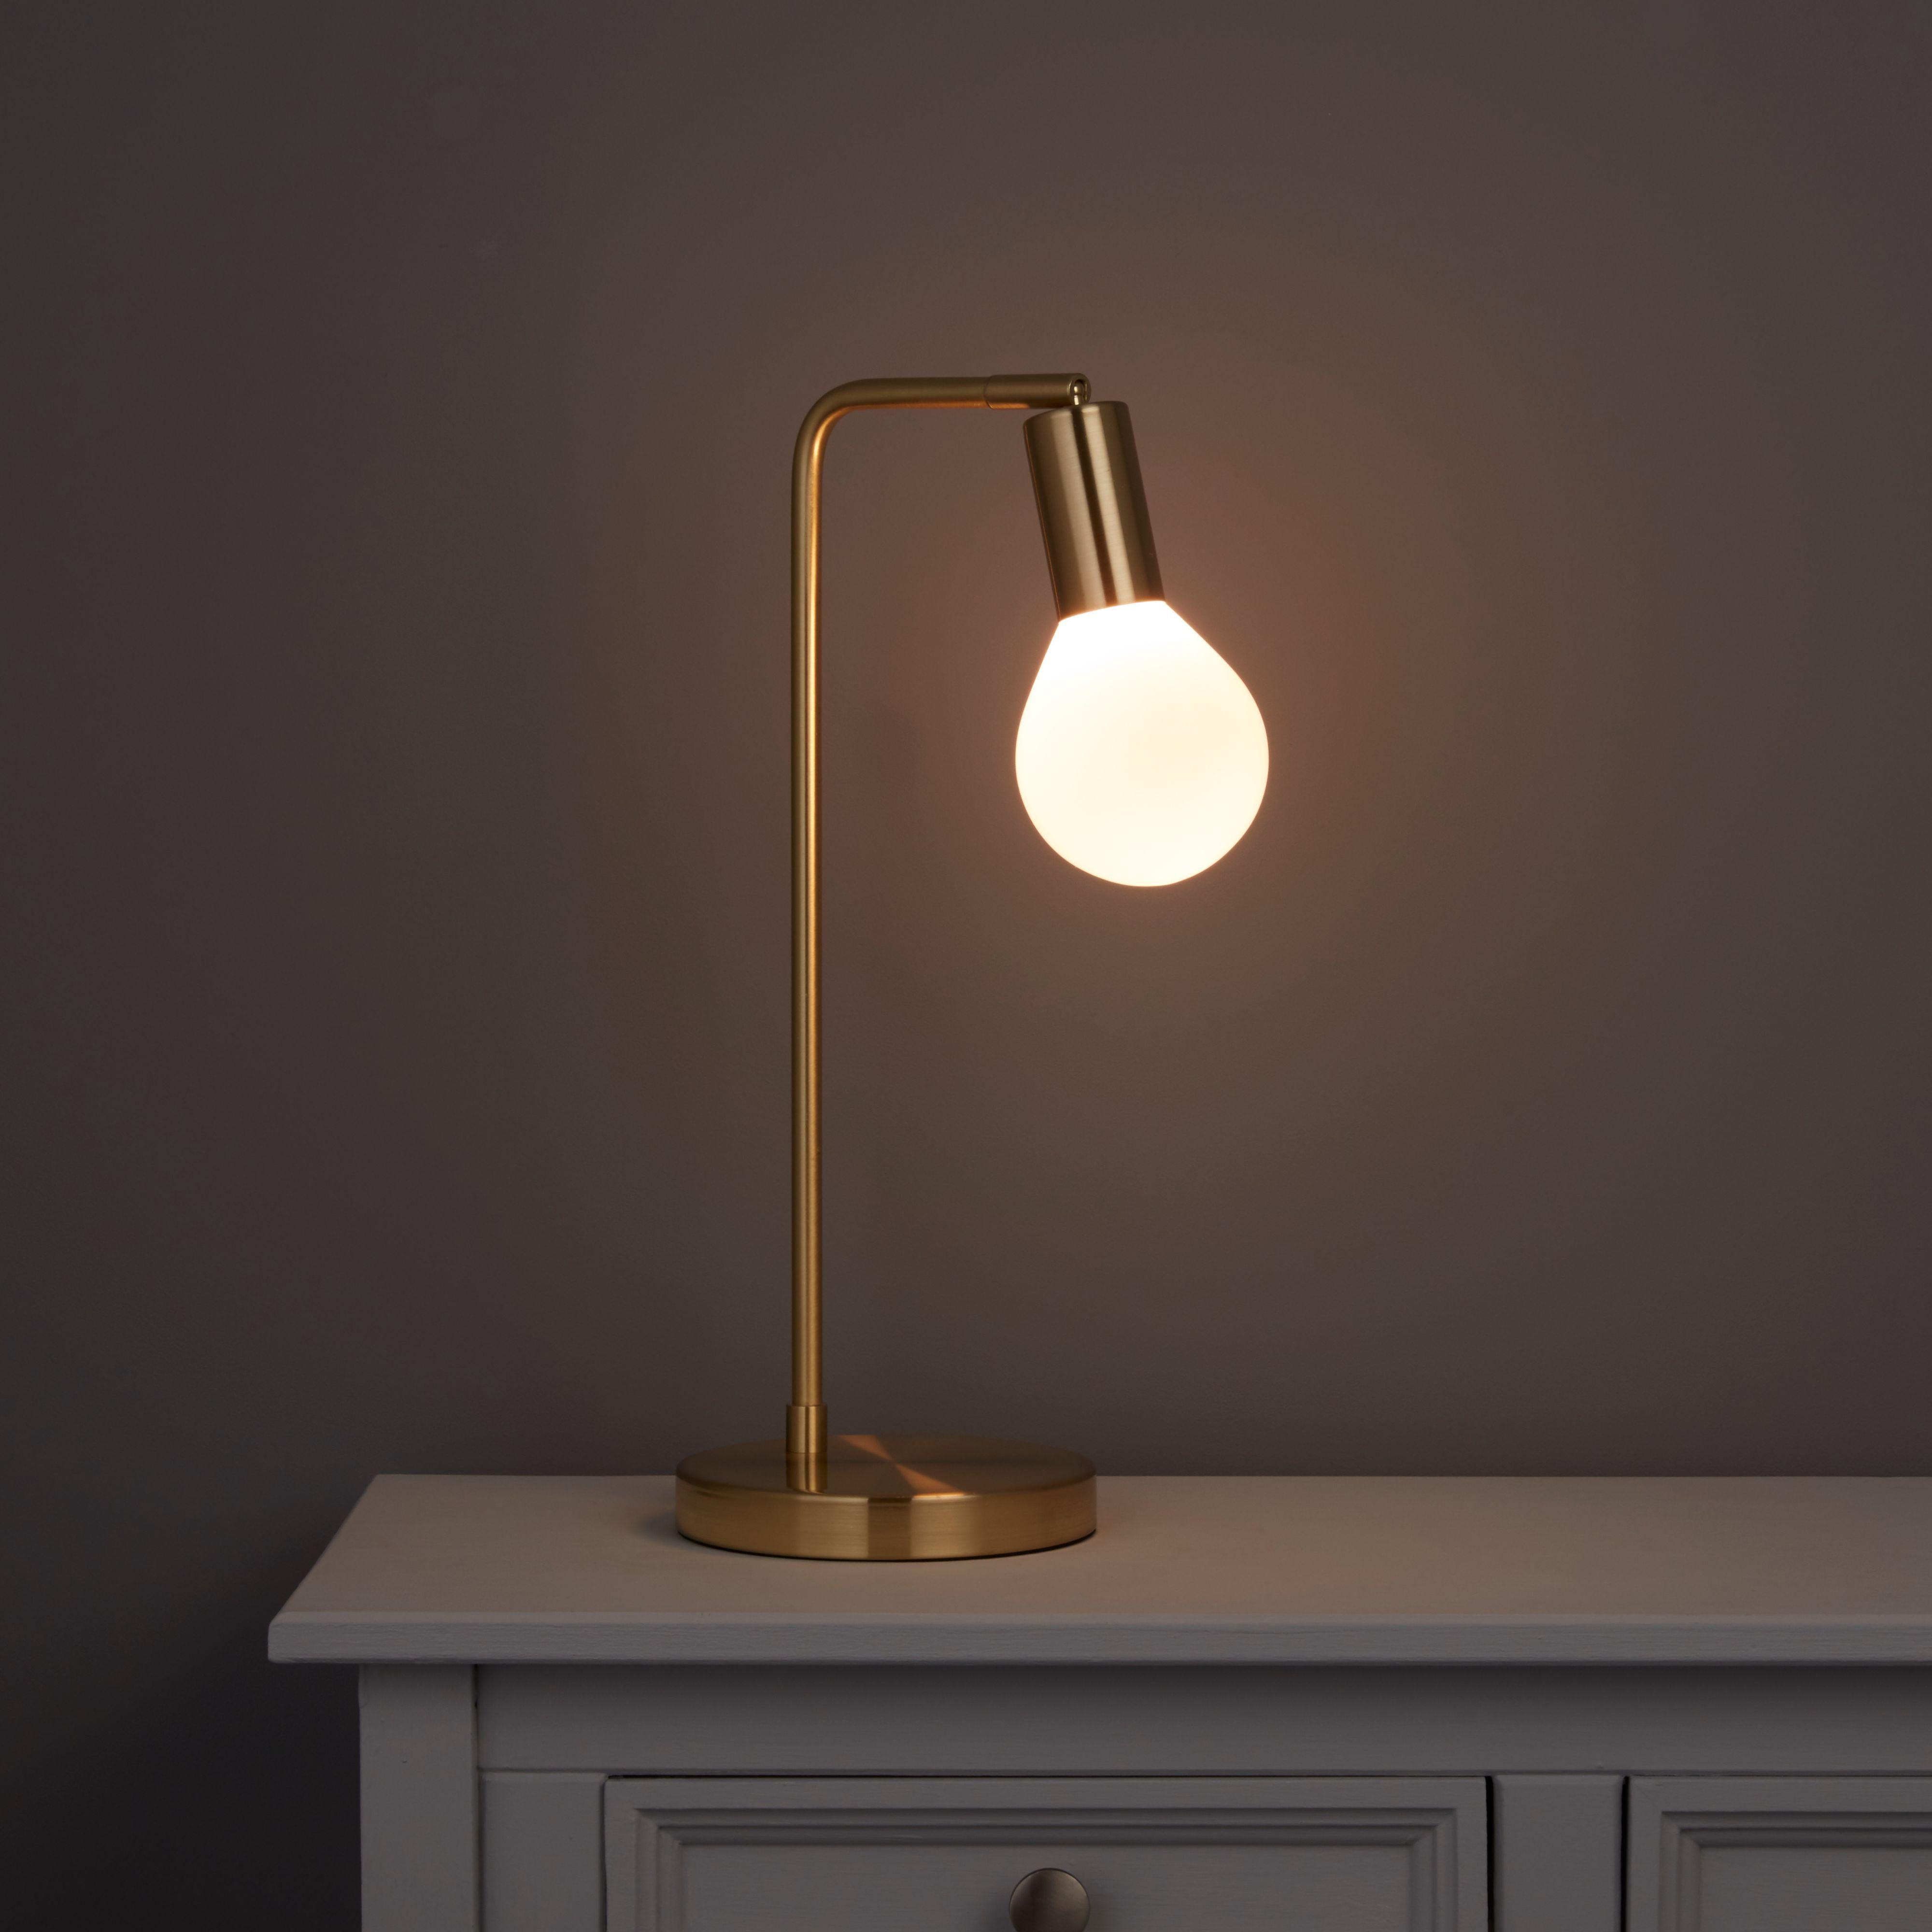 Channing Matt Gold Effect Led Table Lamp Departments Diy At B Q